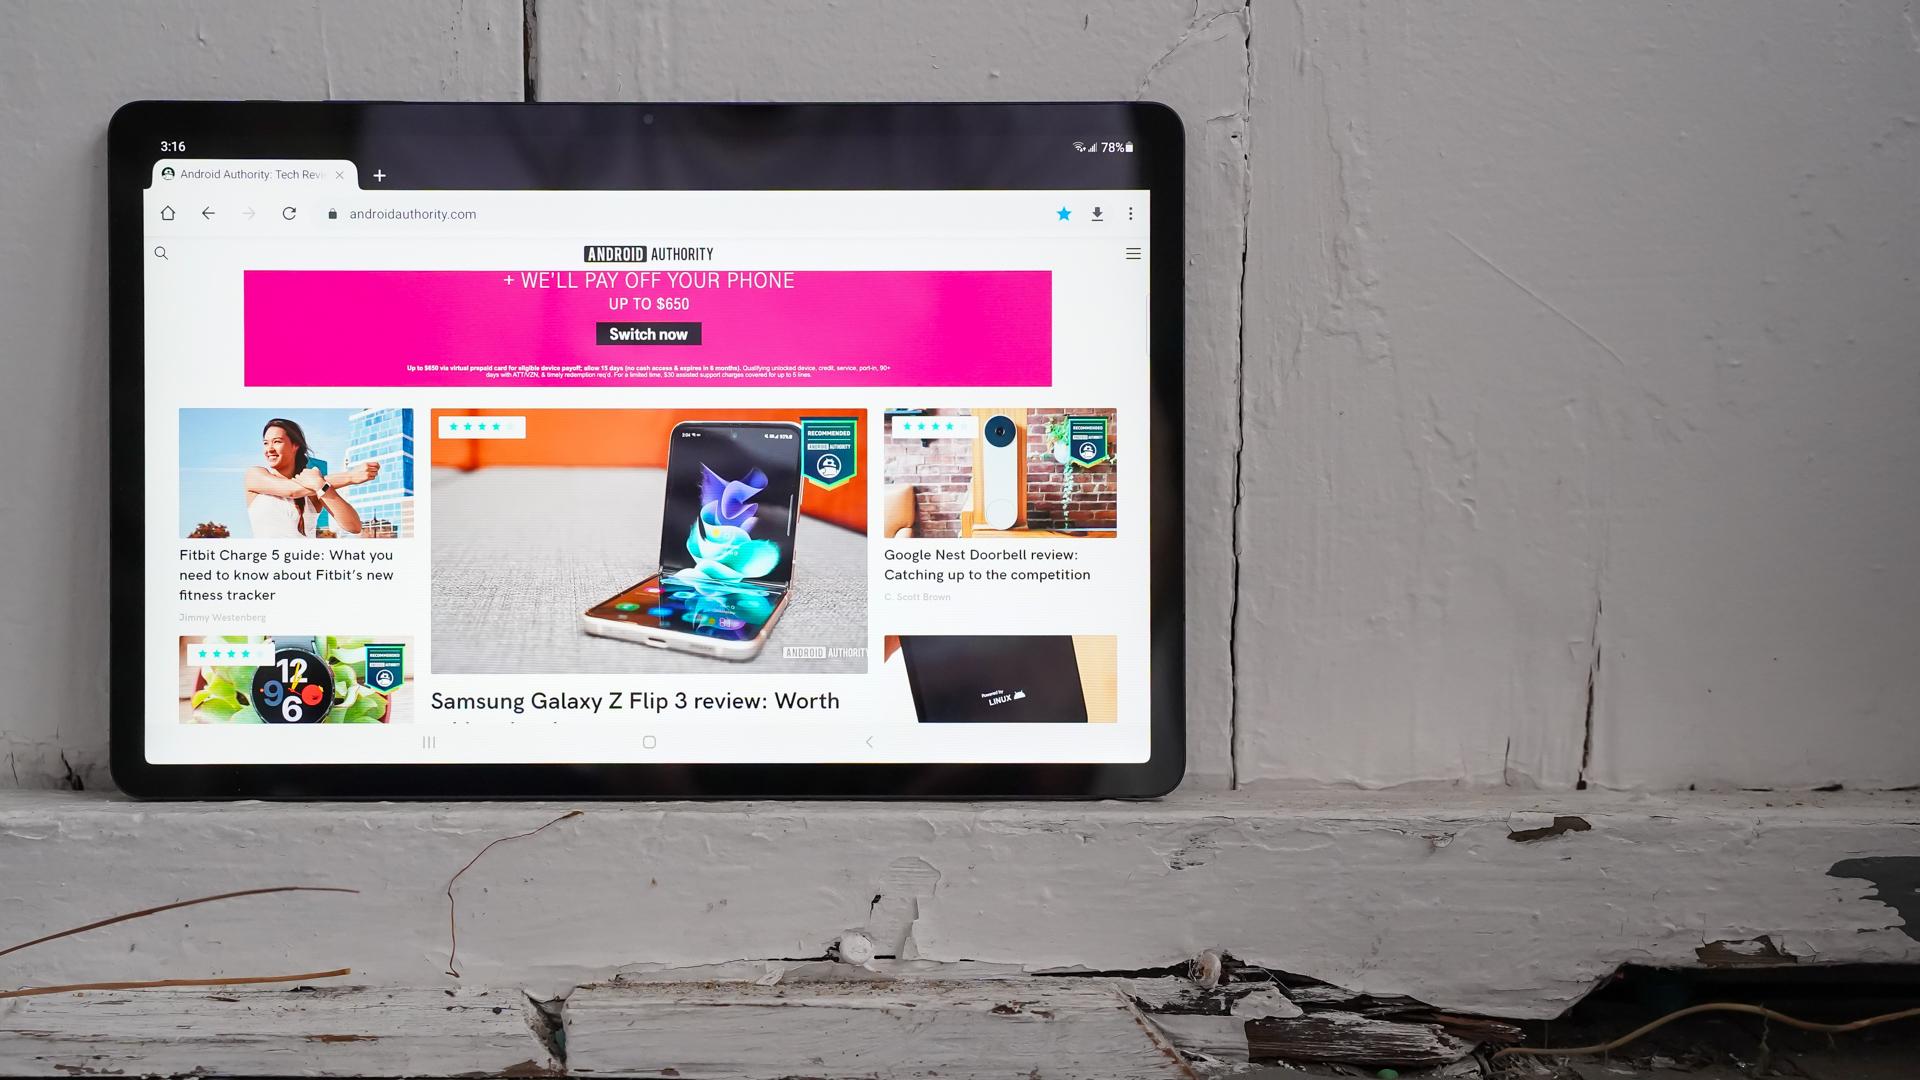 Samsung Galaxy Tab S7 FE Chrome with AA